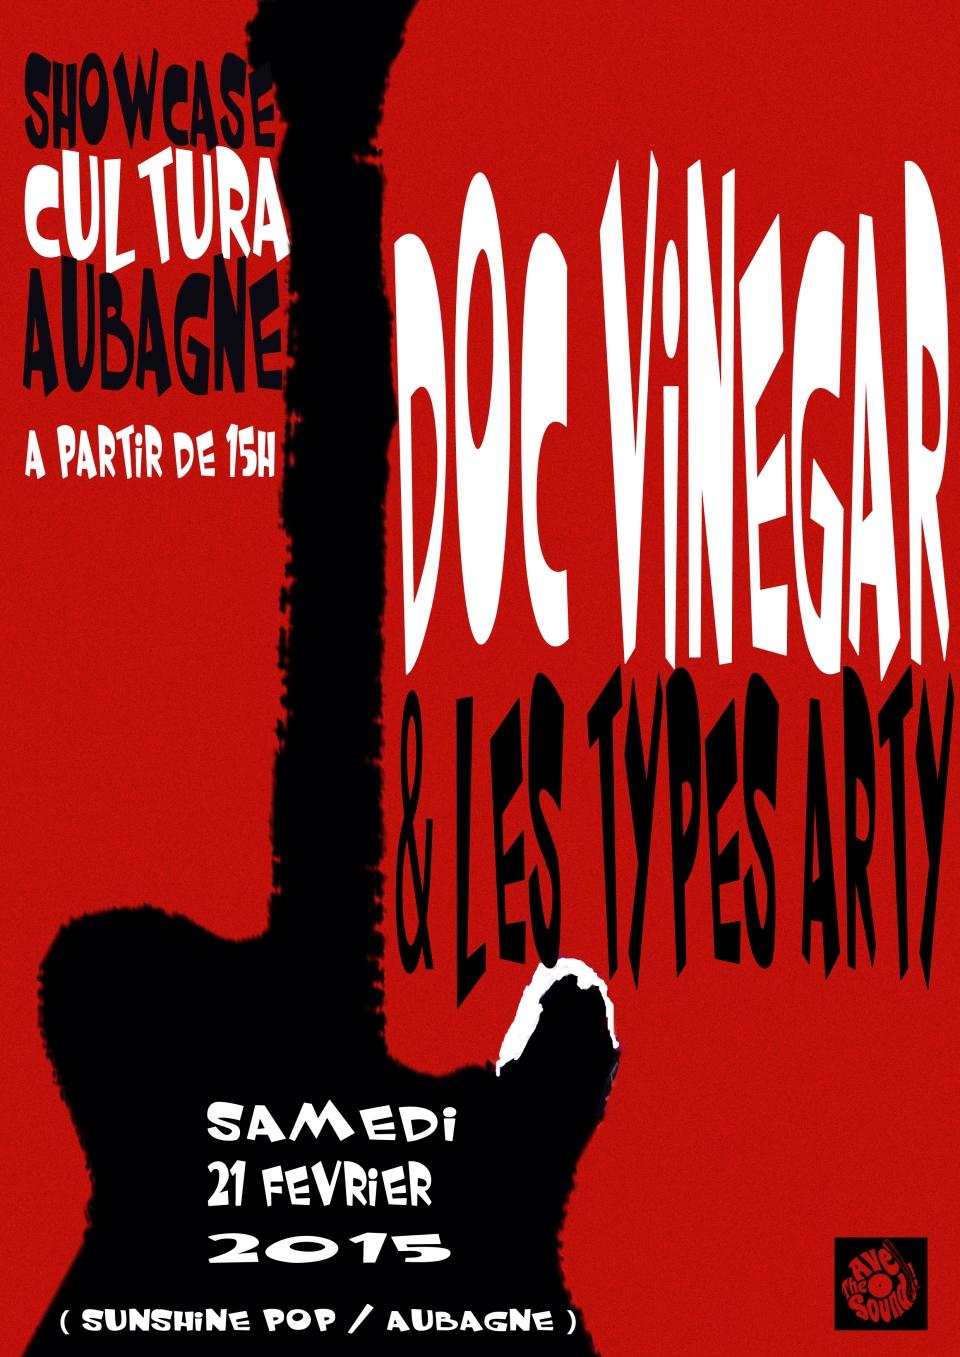 Doc Vinegar Cultura Aubagne Showacse